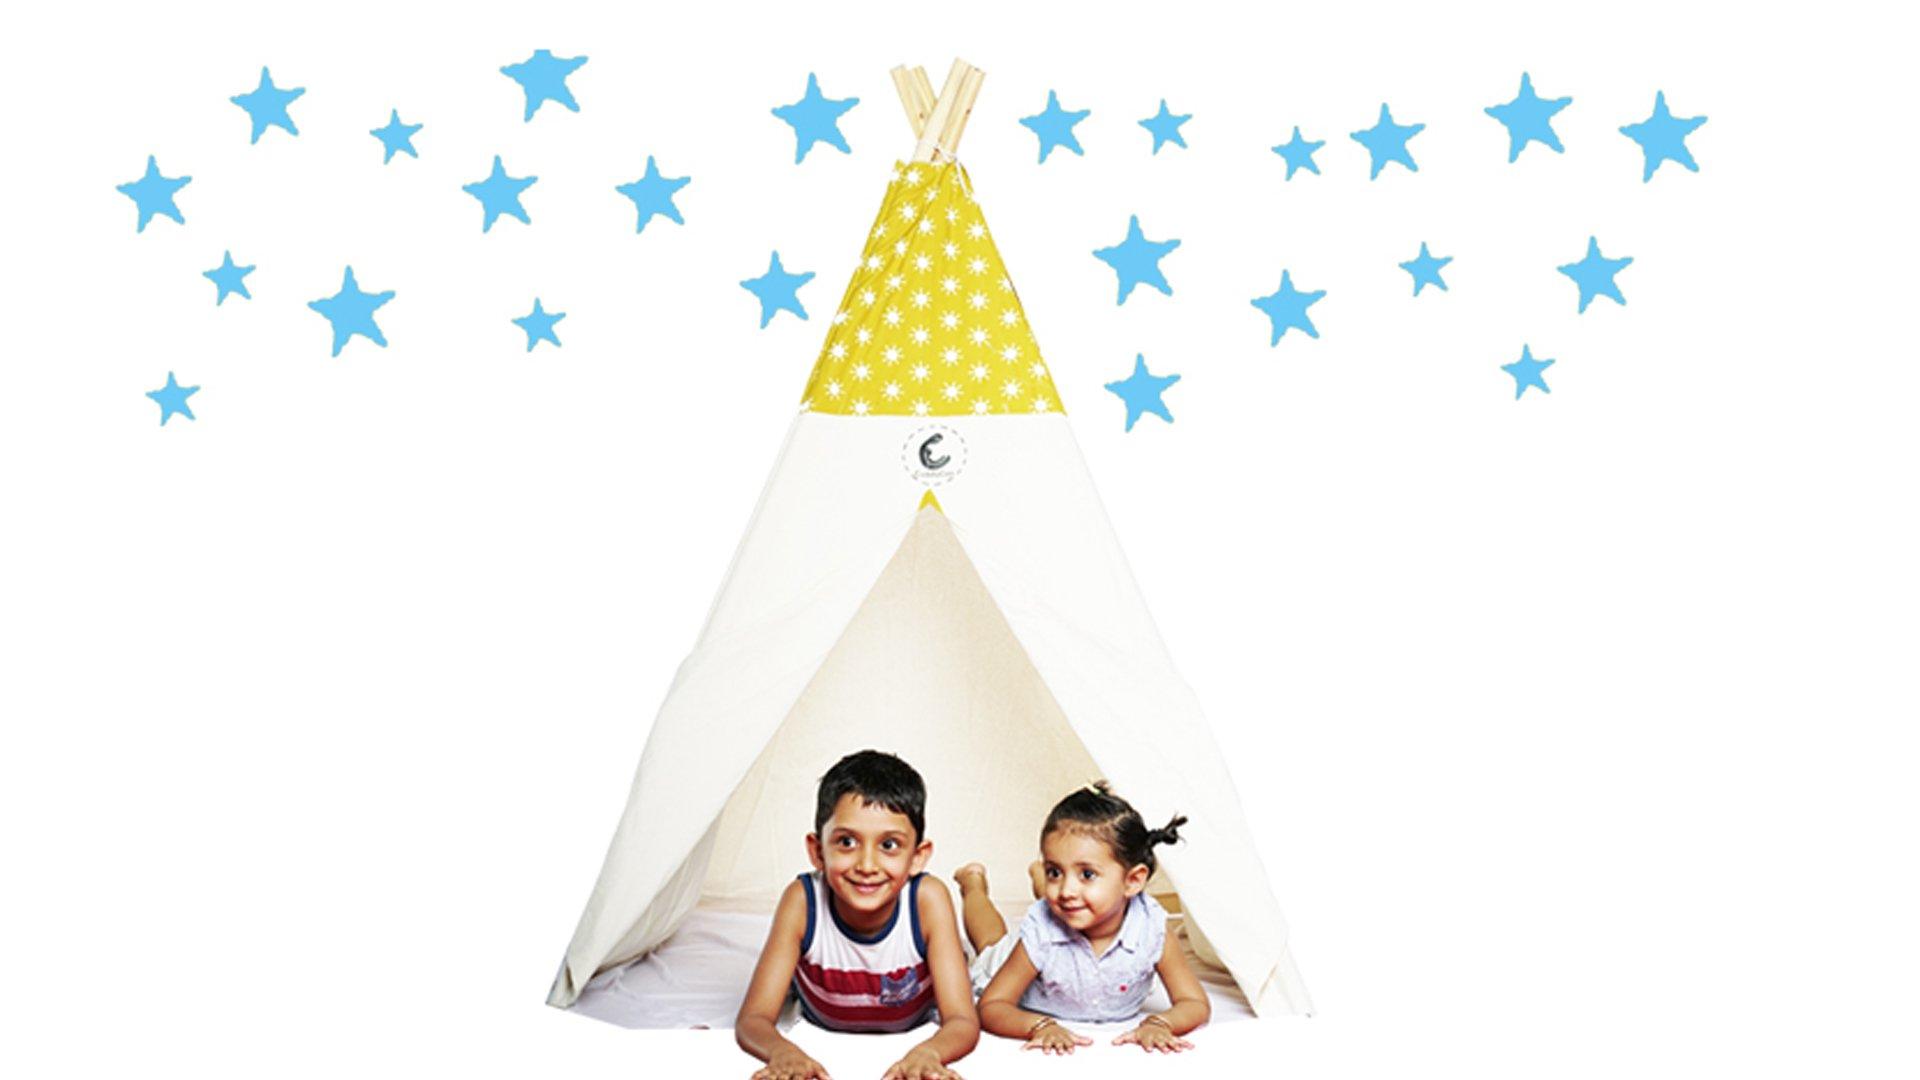 Children's teepee tent